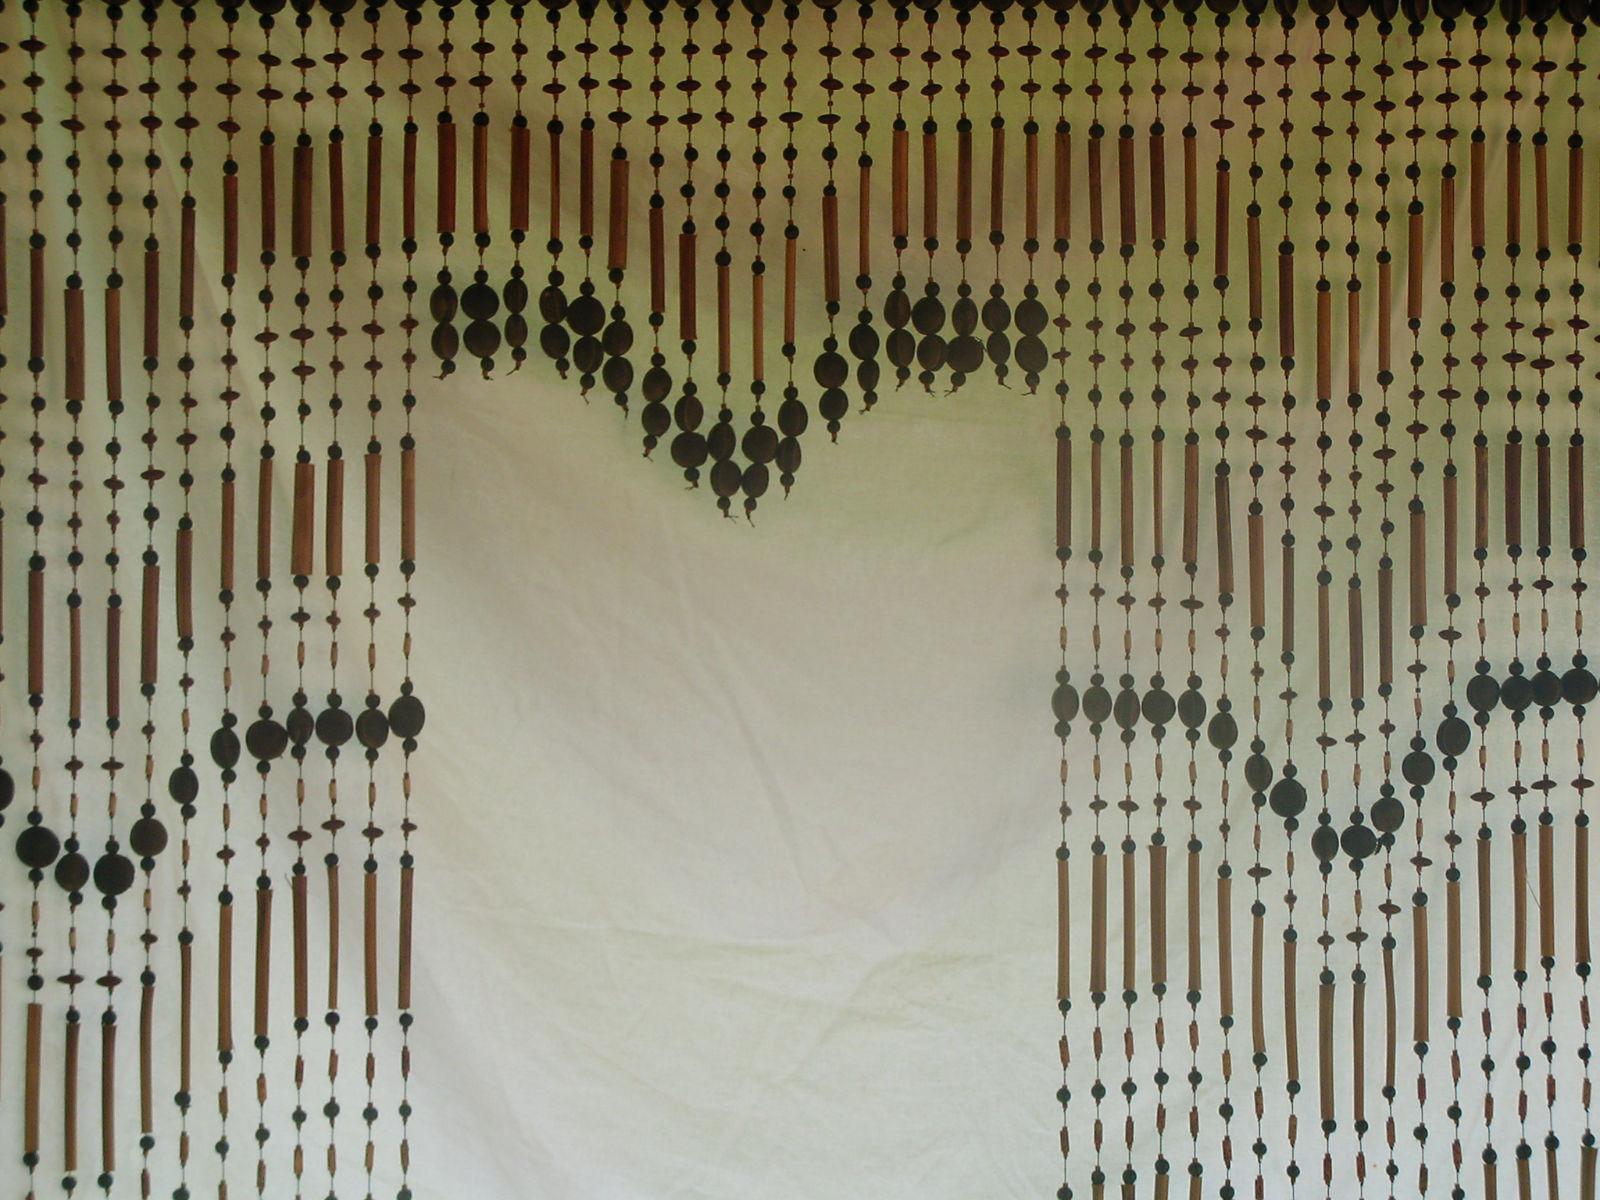 Pin cortina lagrima on pinterest - Cortina de bambu ...